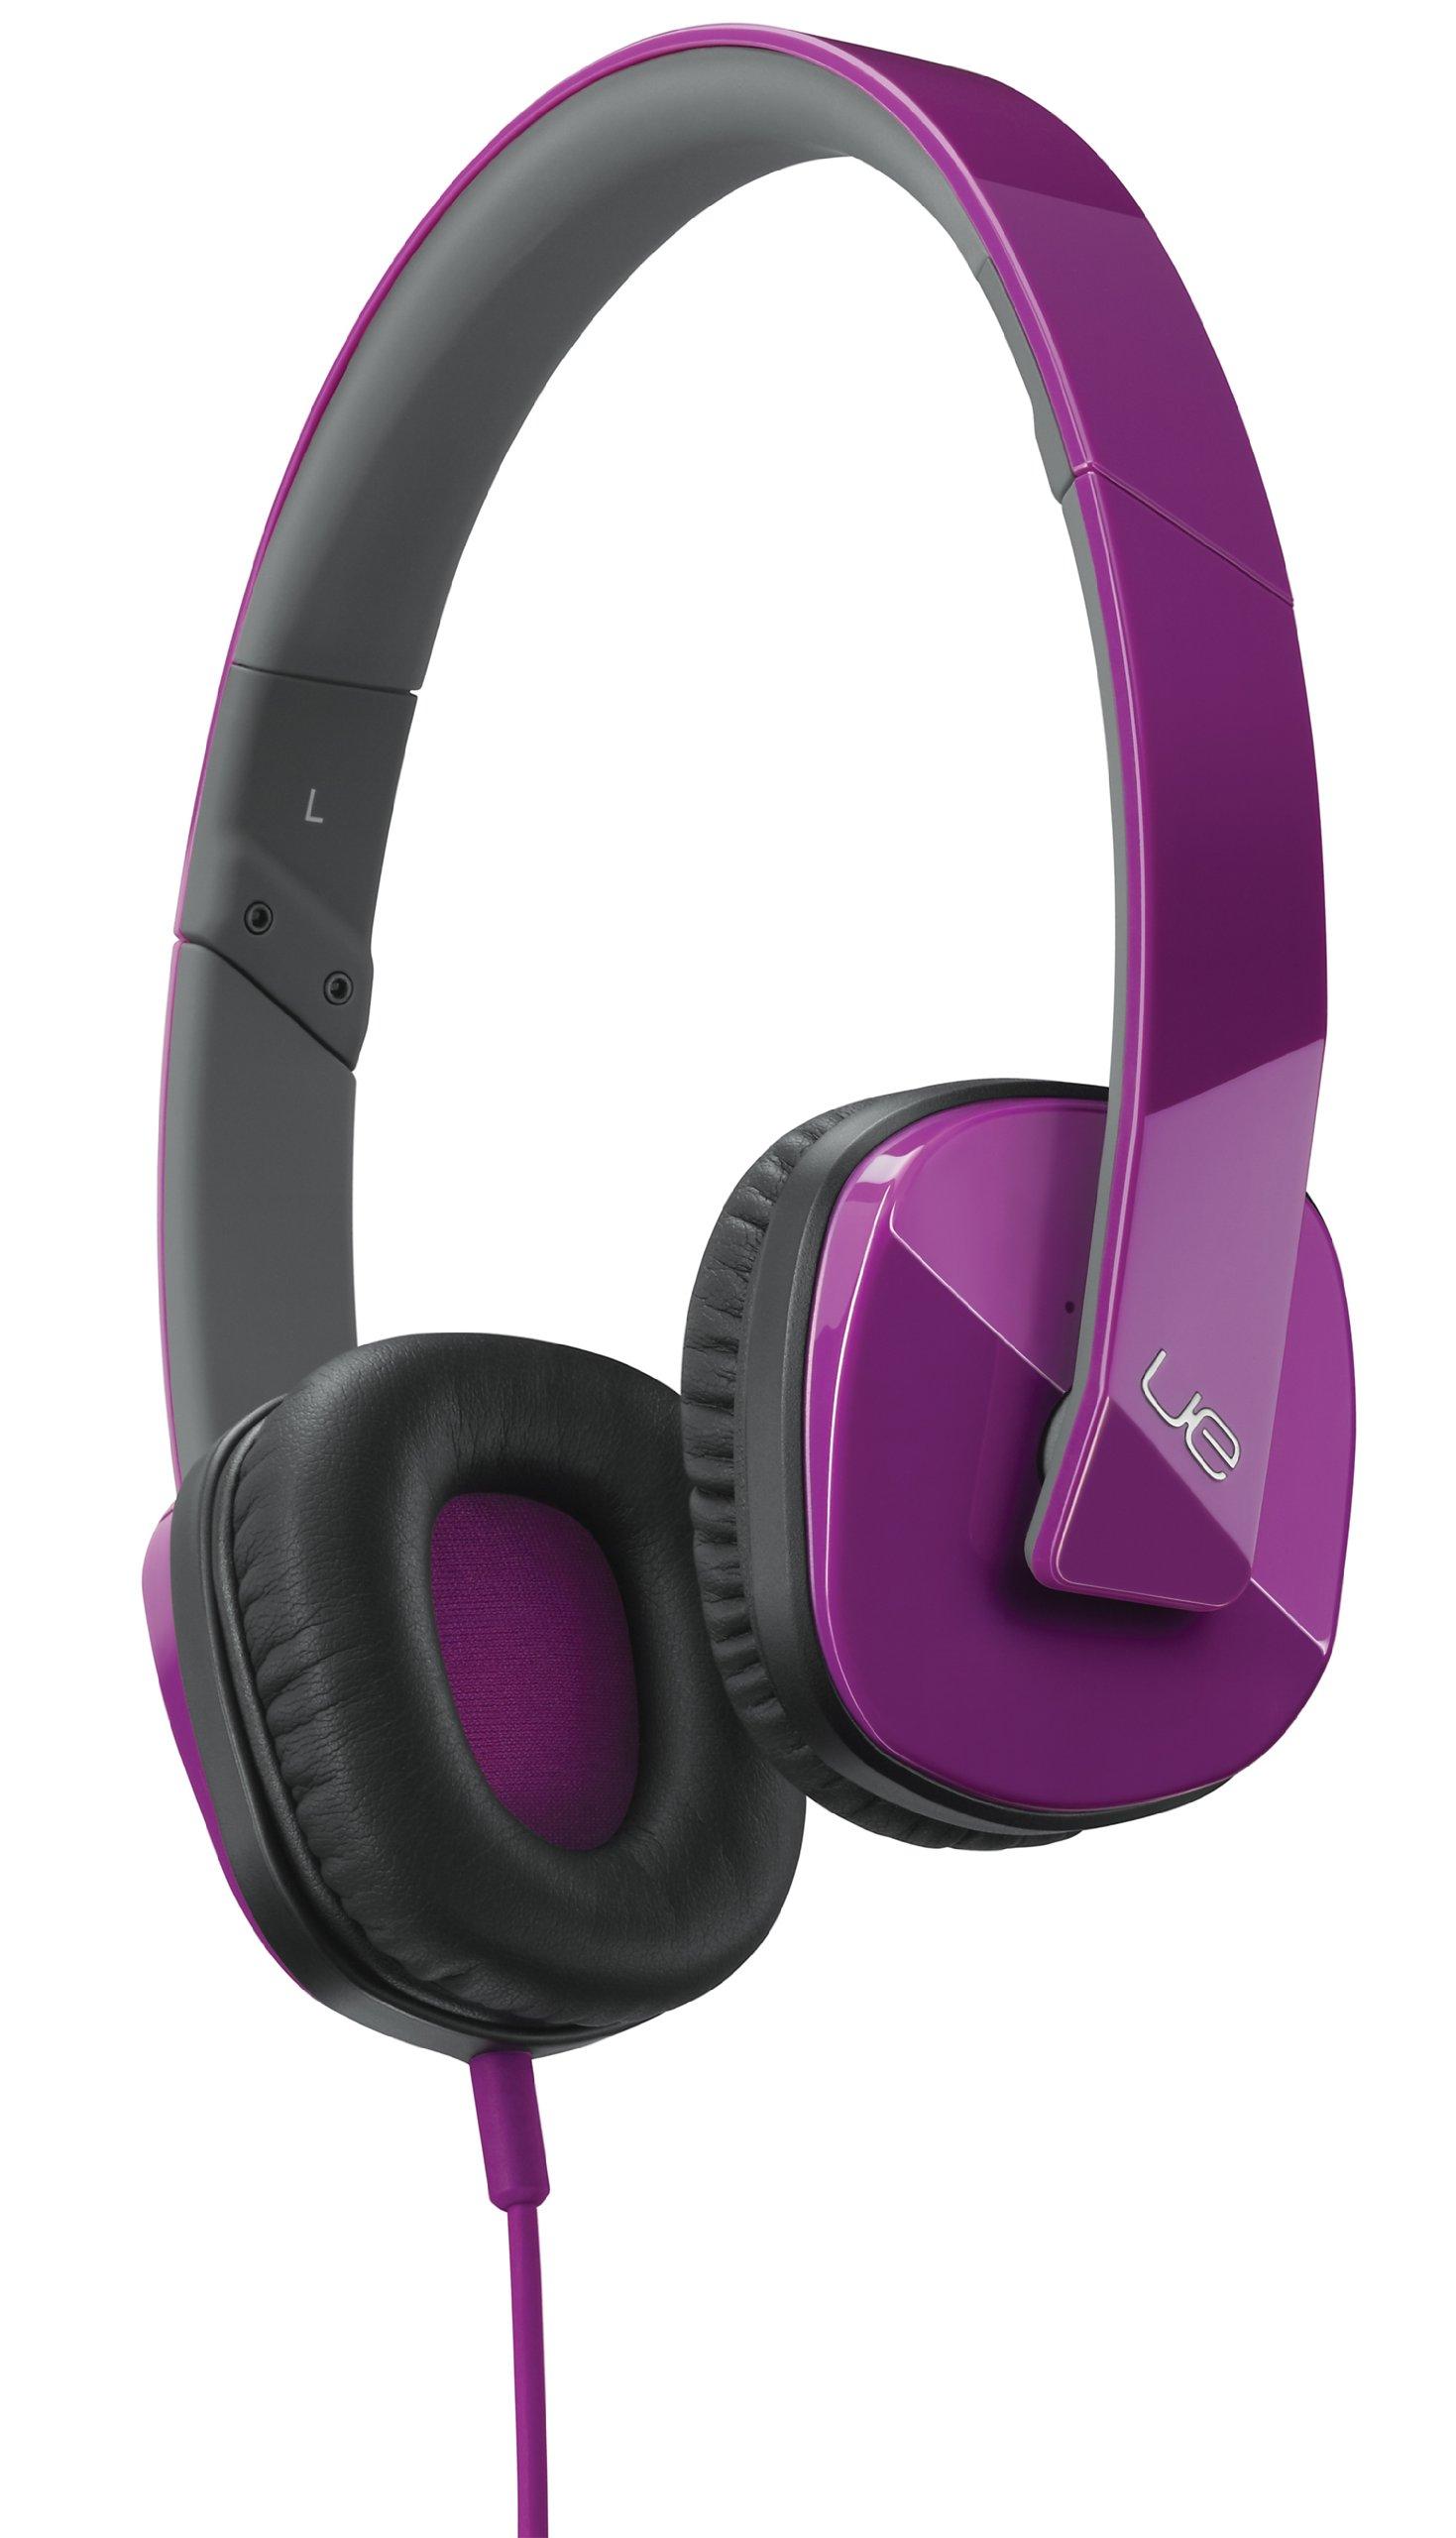 Logitech 982-000074 UE 4000 Headphones - Purple (Discontinued by Manufacturer)